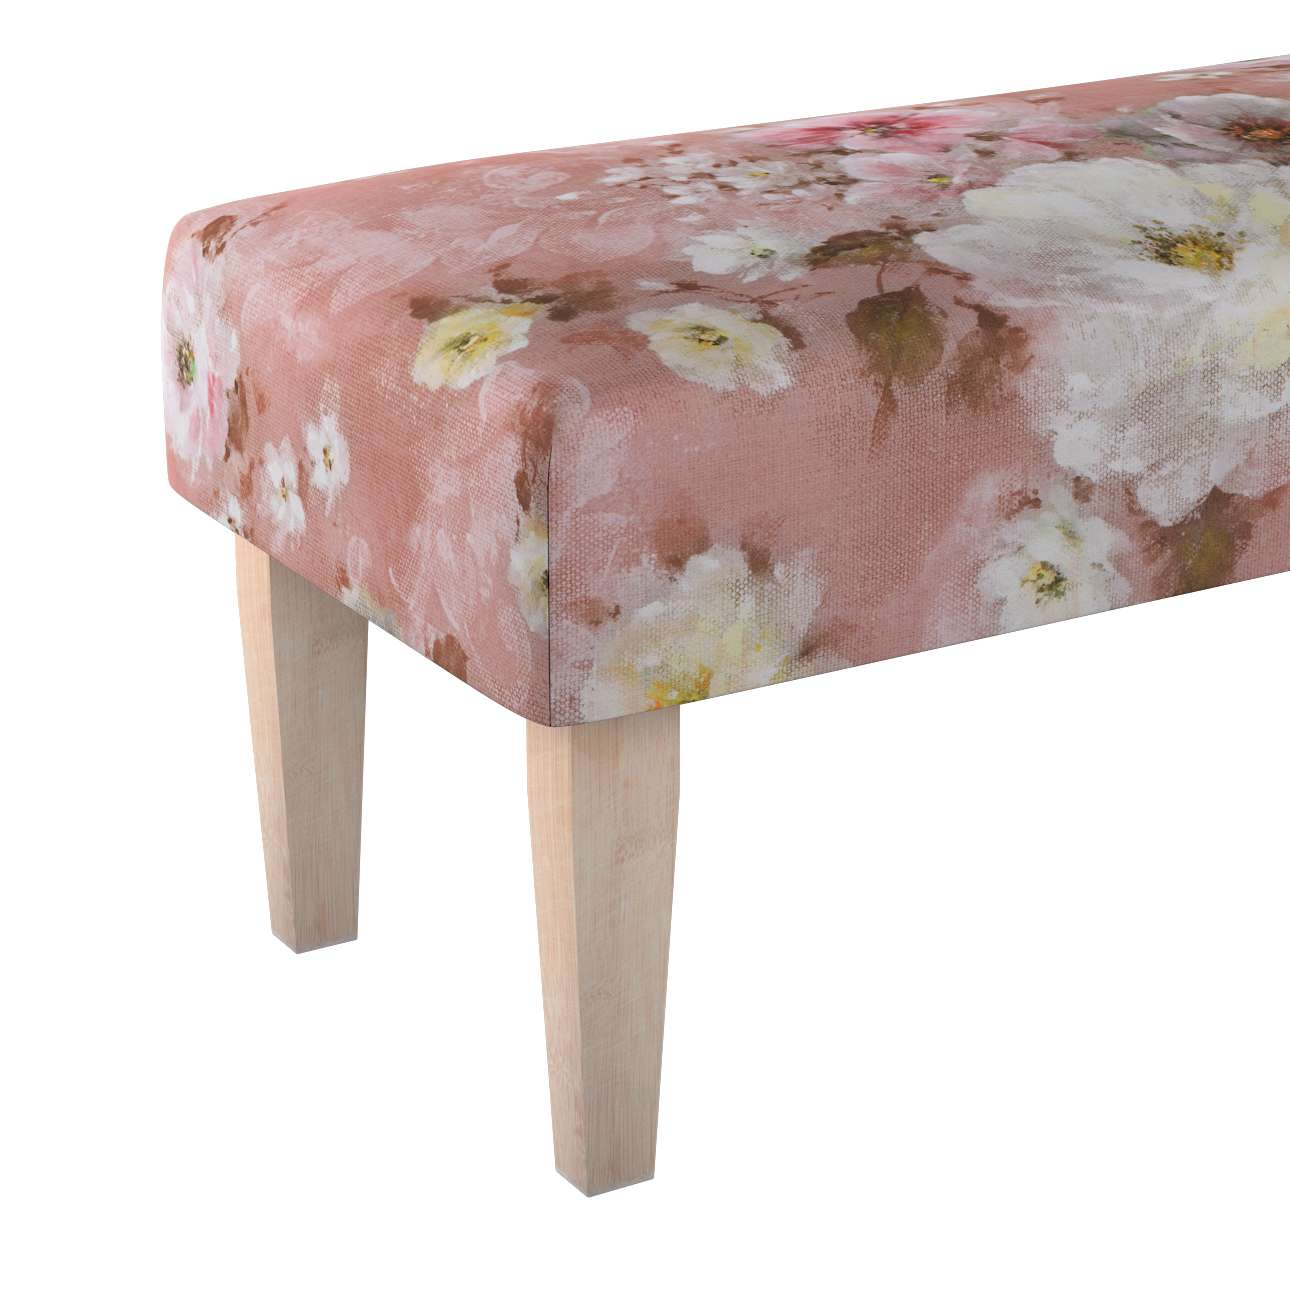 Ławka w kolekcji Monet, tkanina: 137-83